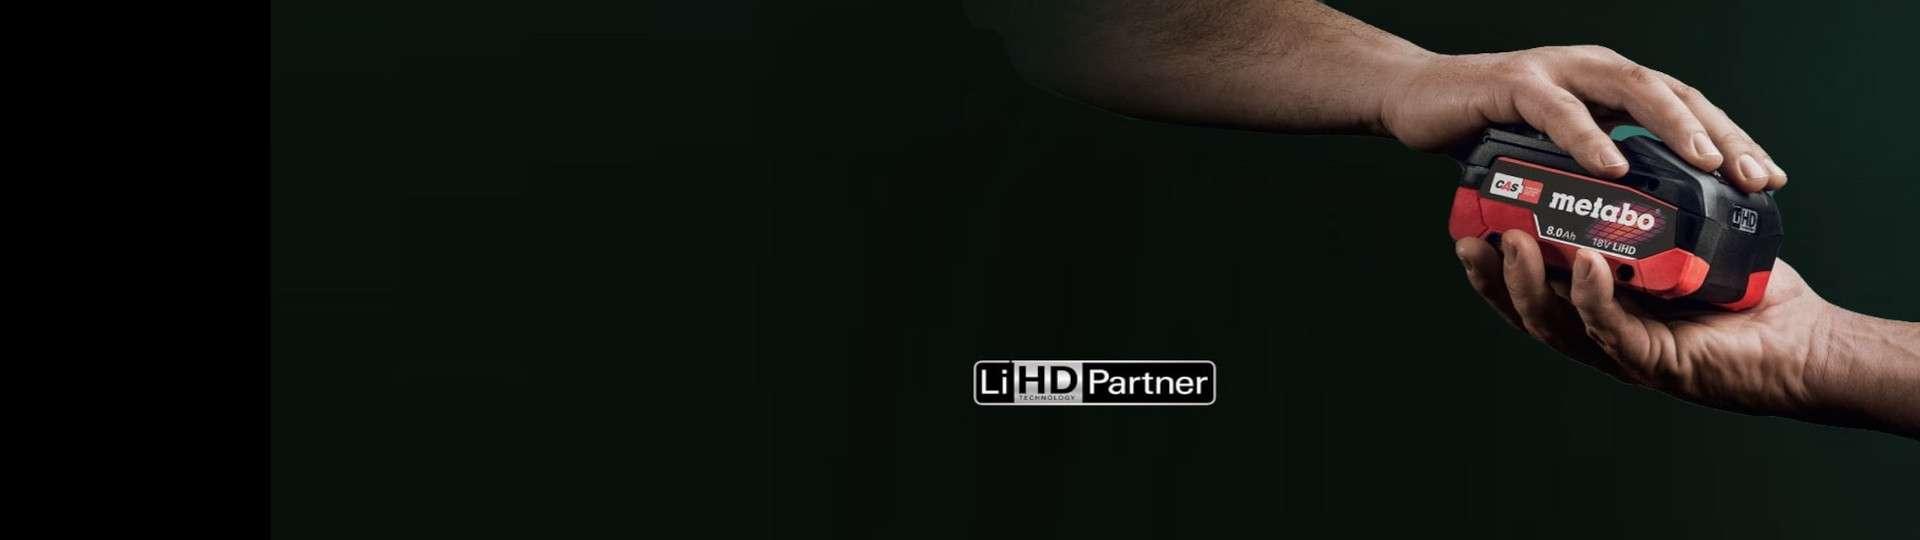 Li HD Partner